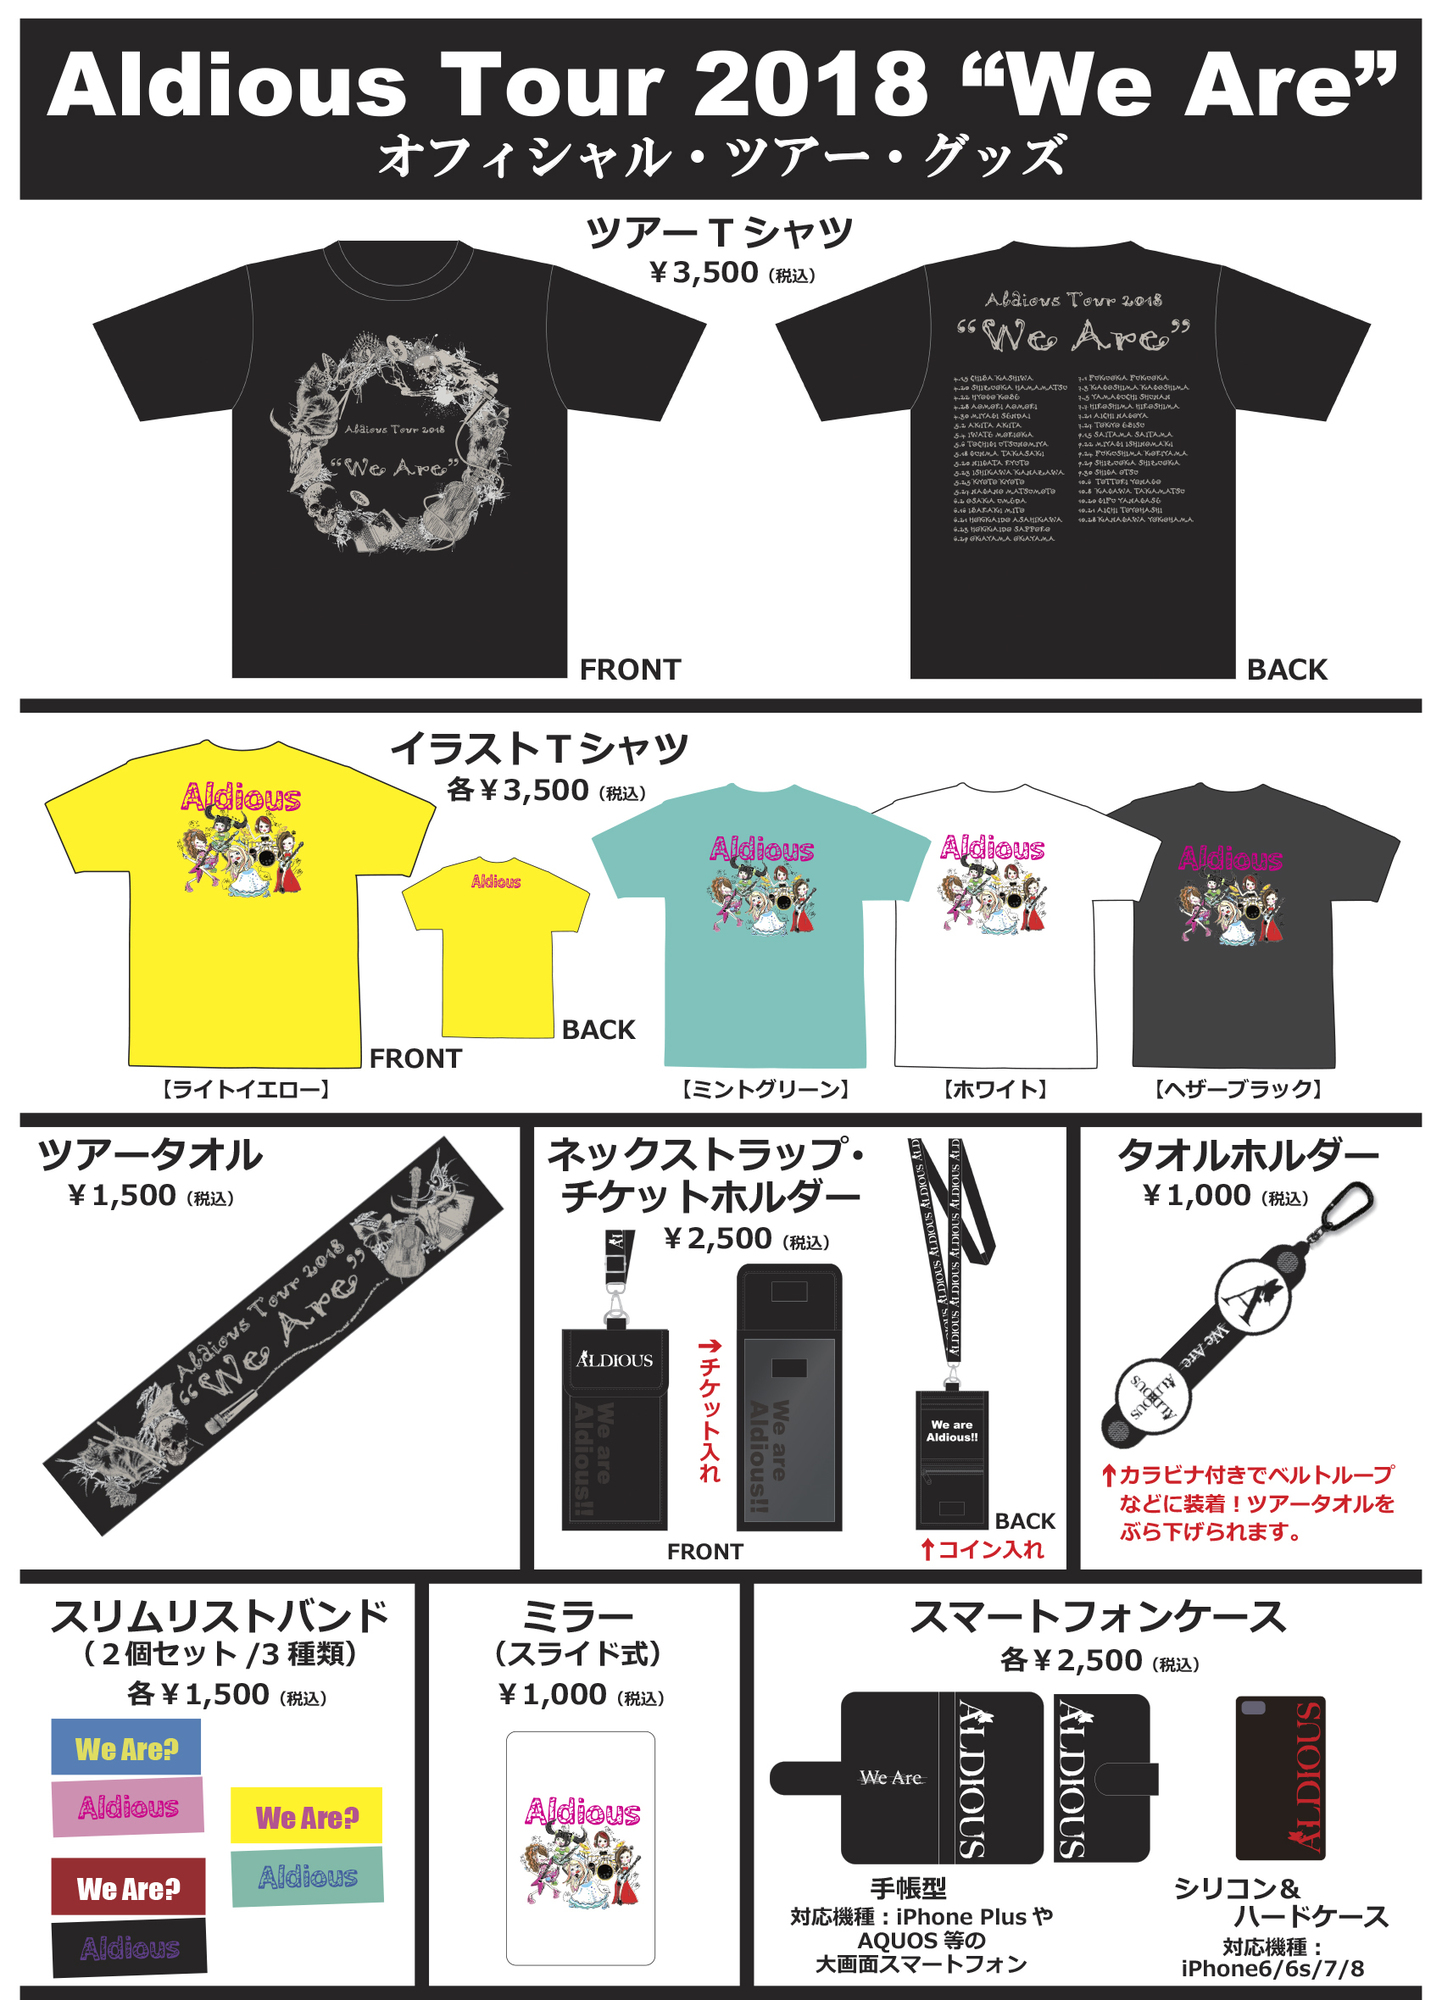 aldious tour 2018 we are オフィシャルグッズ情報 aldious official